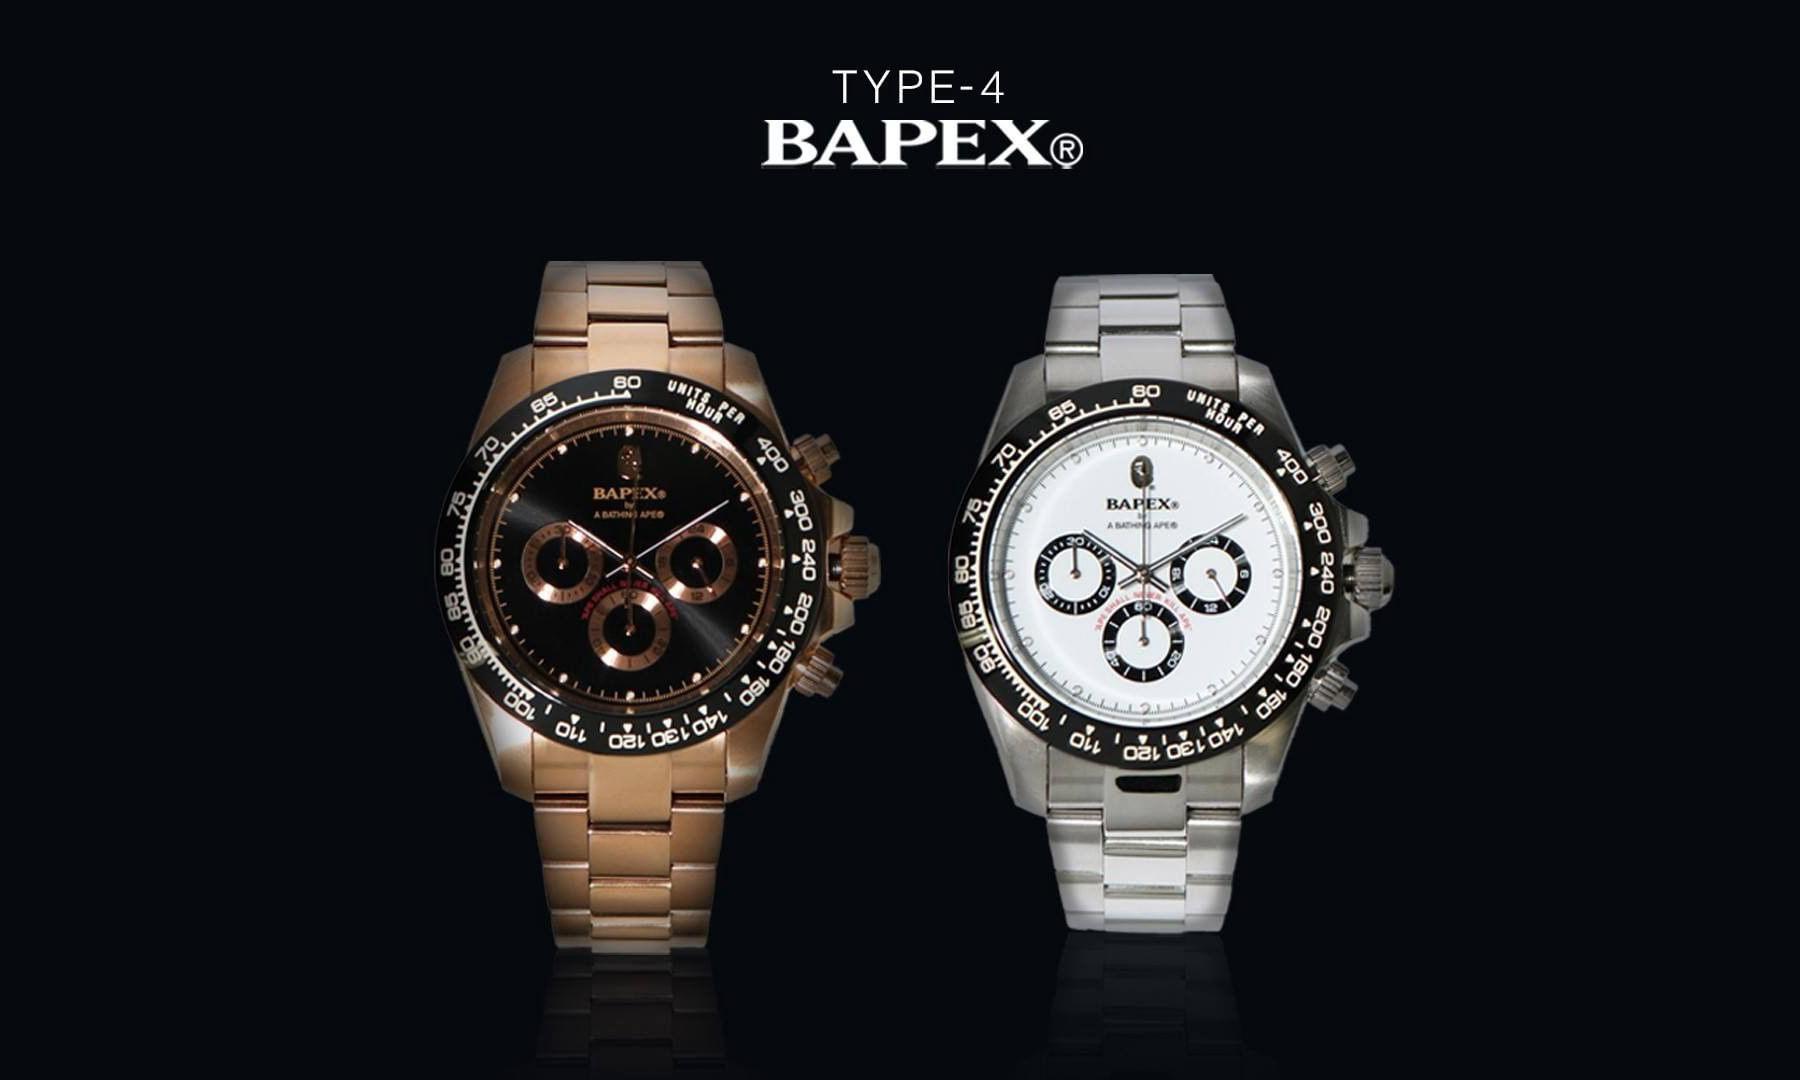 BAPE® 为 TYPE-4 腕表推出全新设计